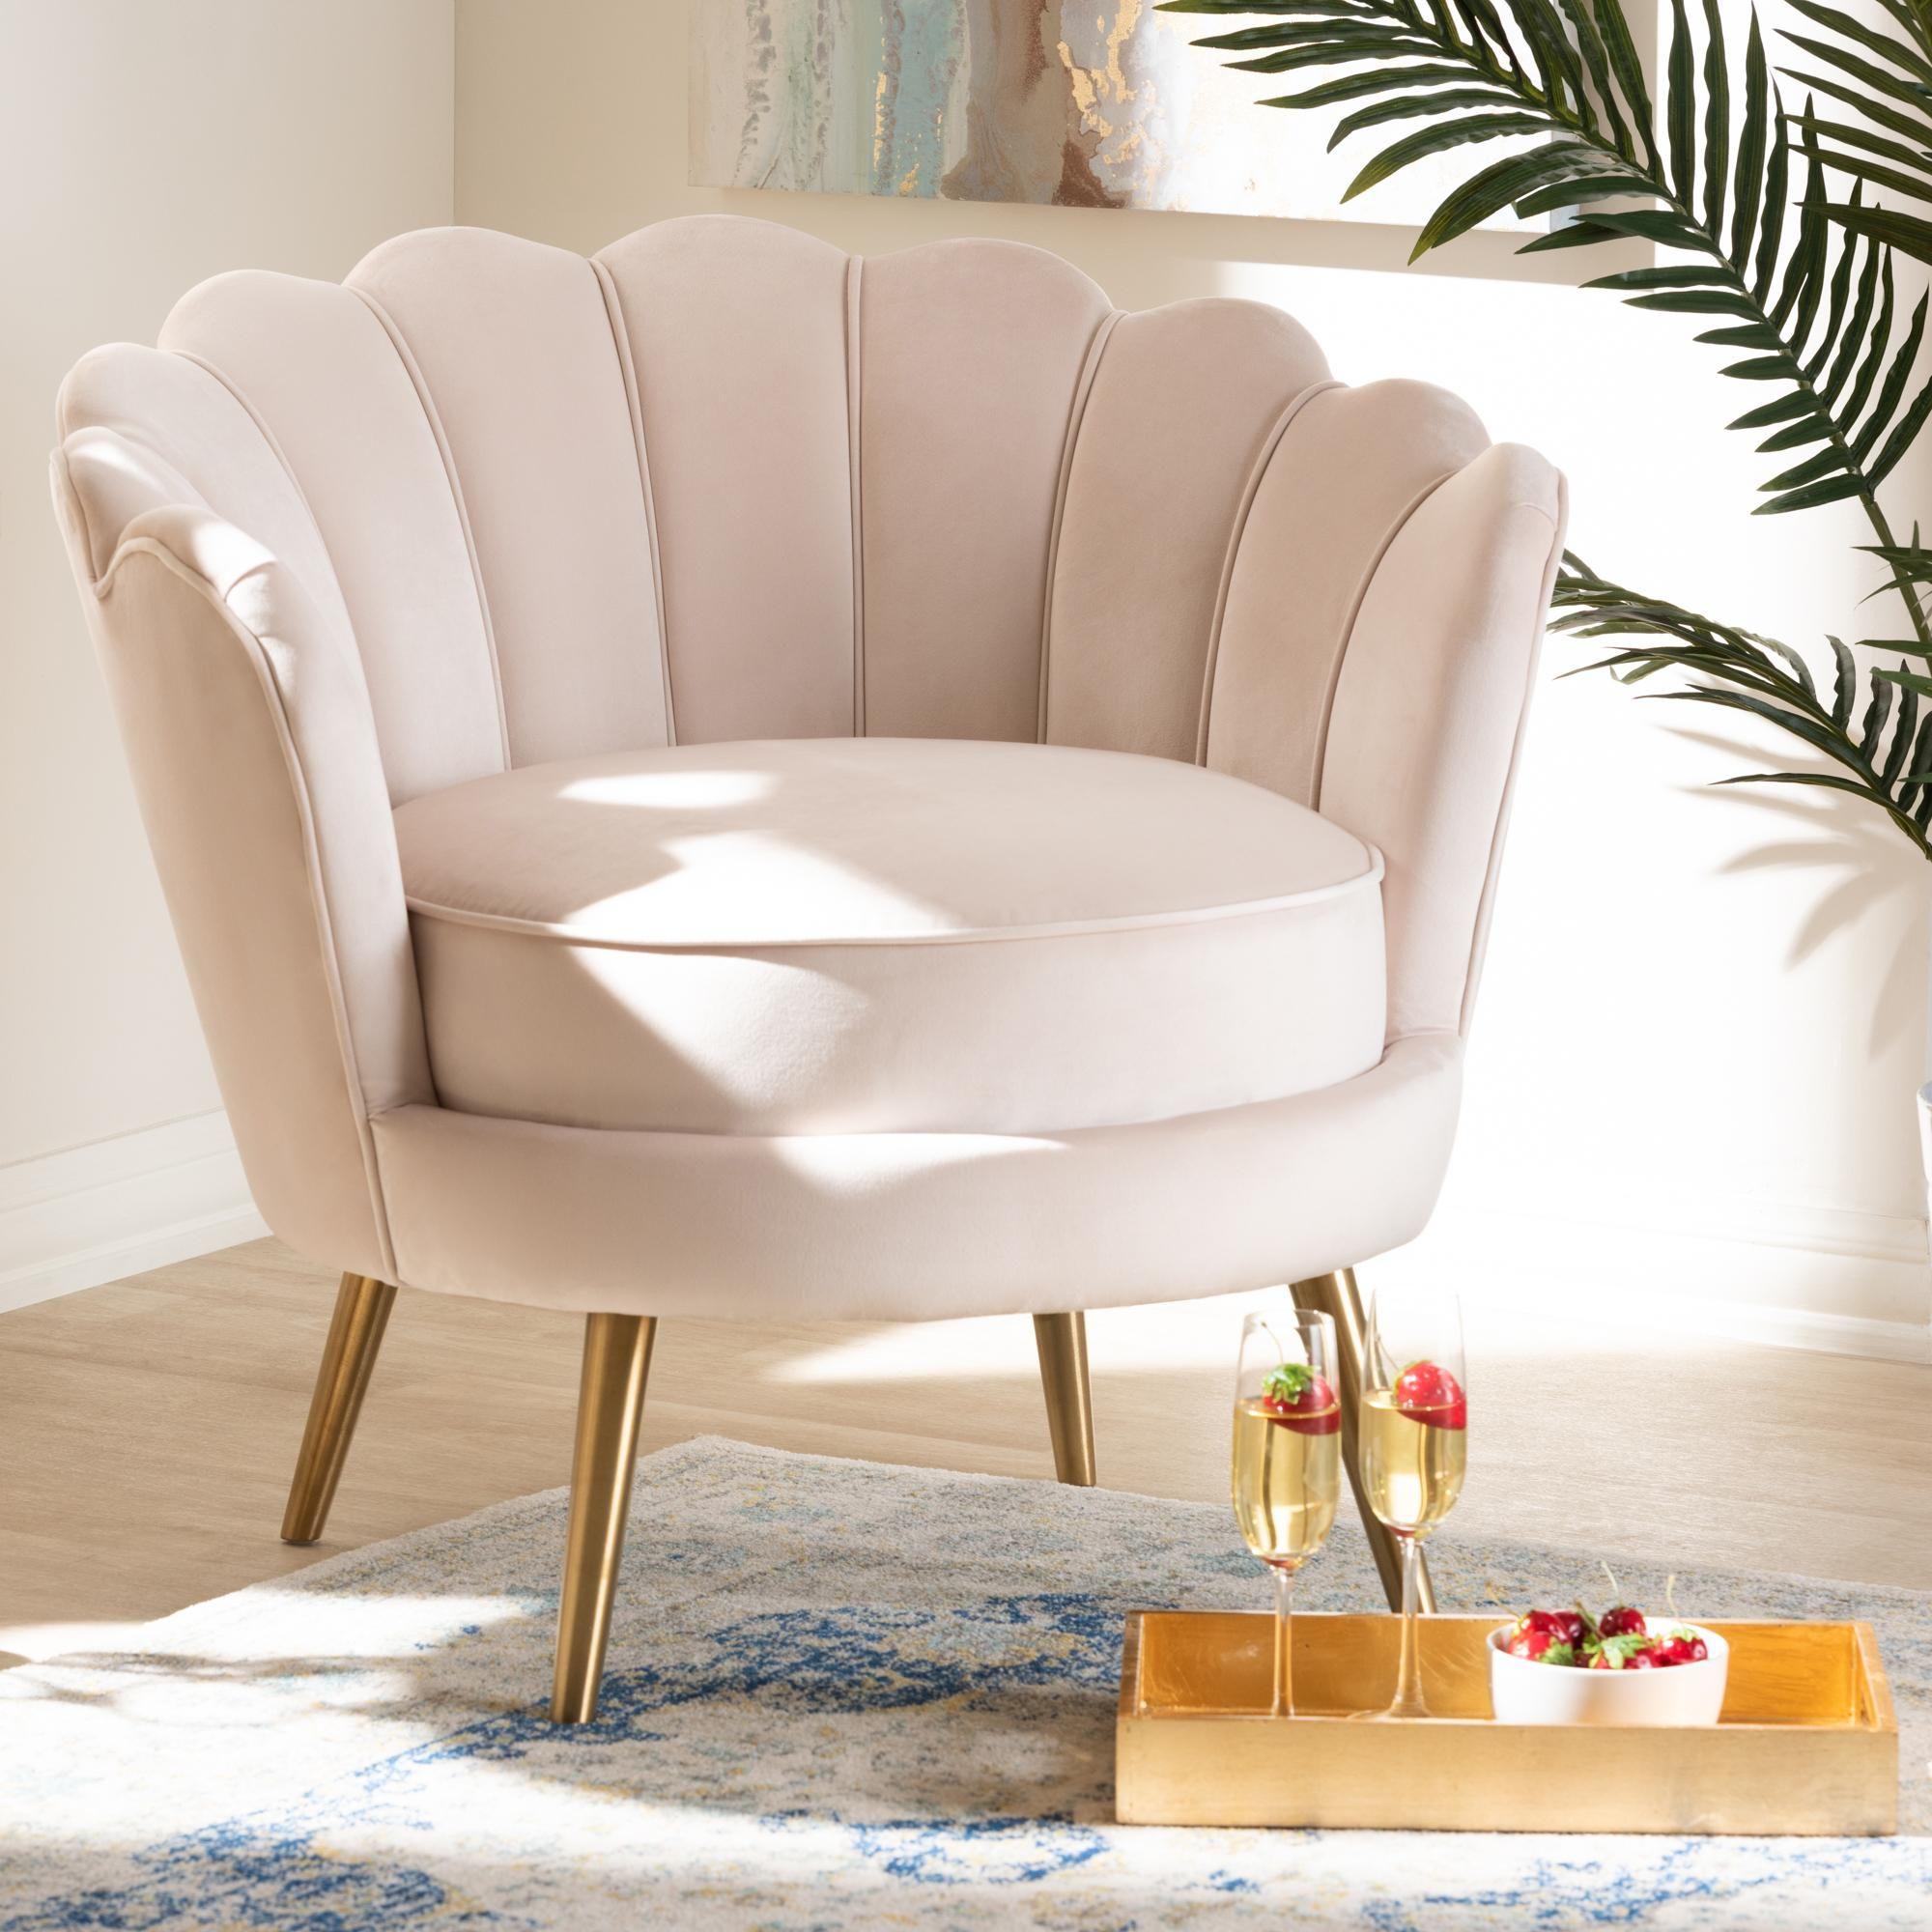 Baxton studio cosette light beige seashell accent chair in